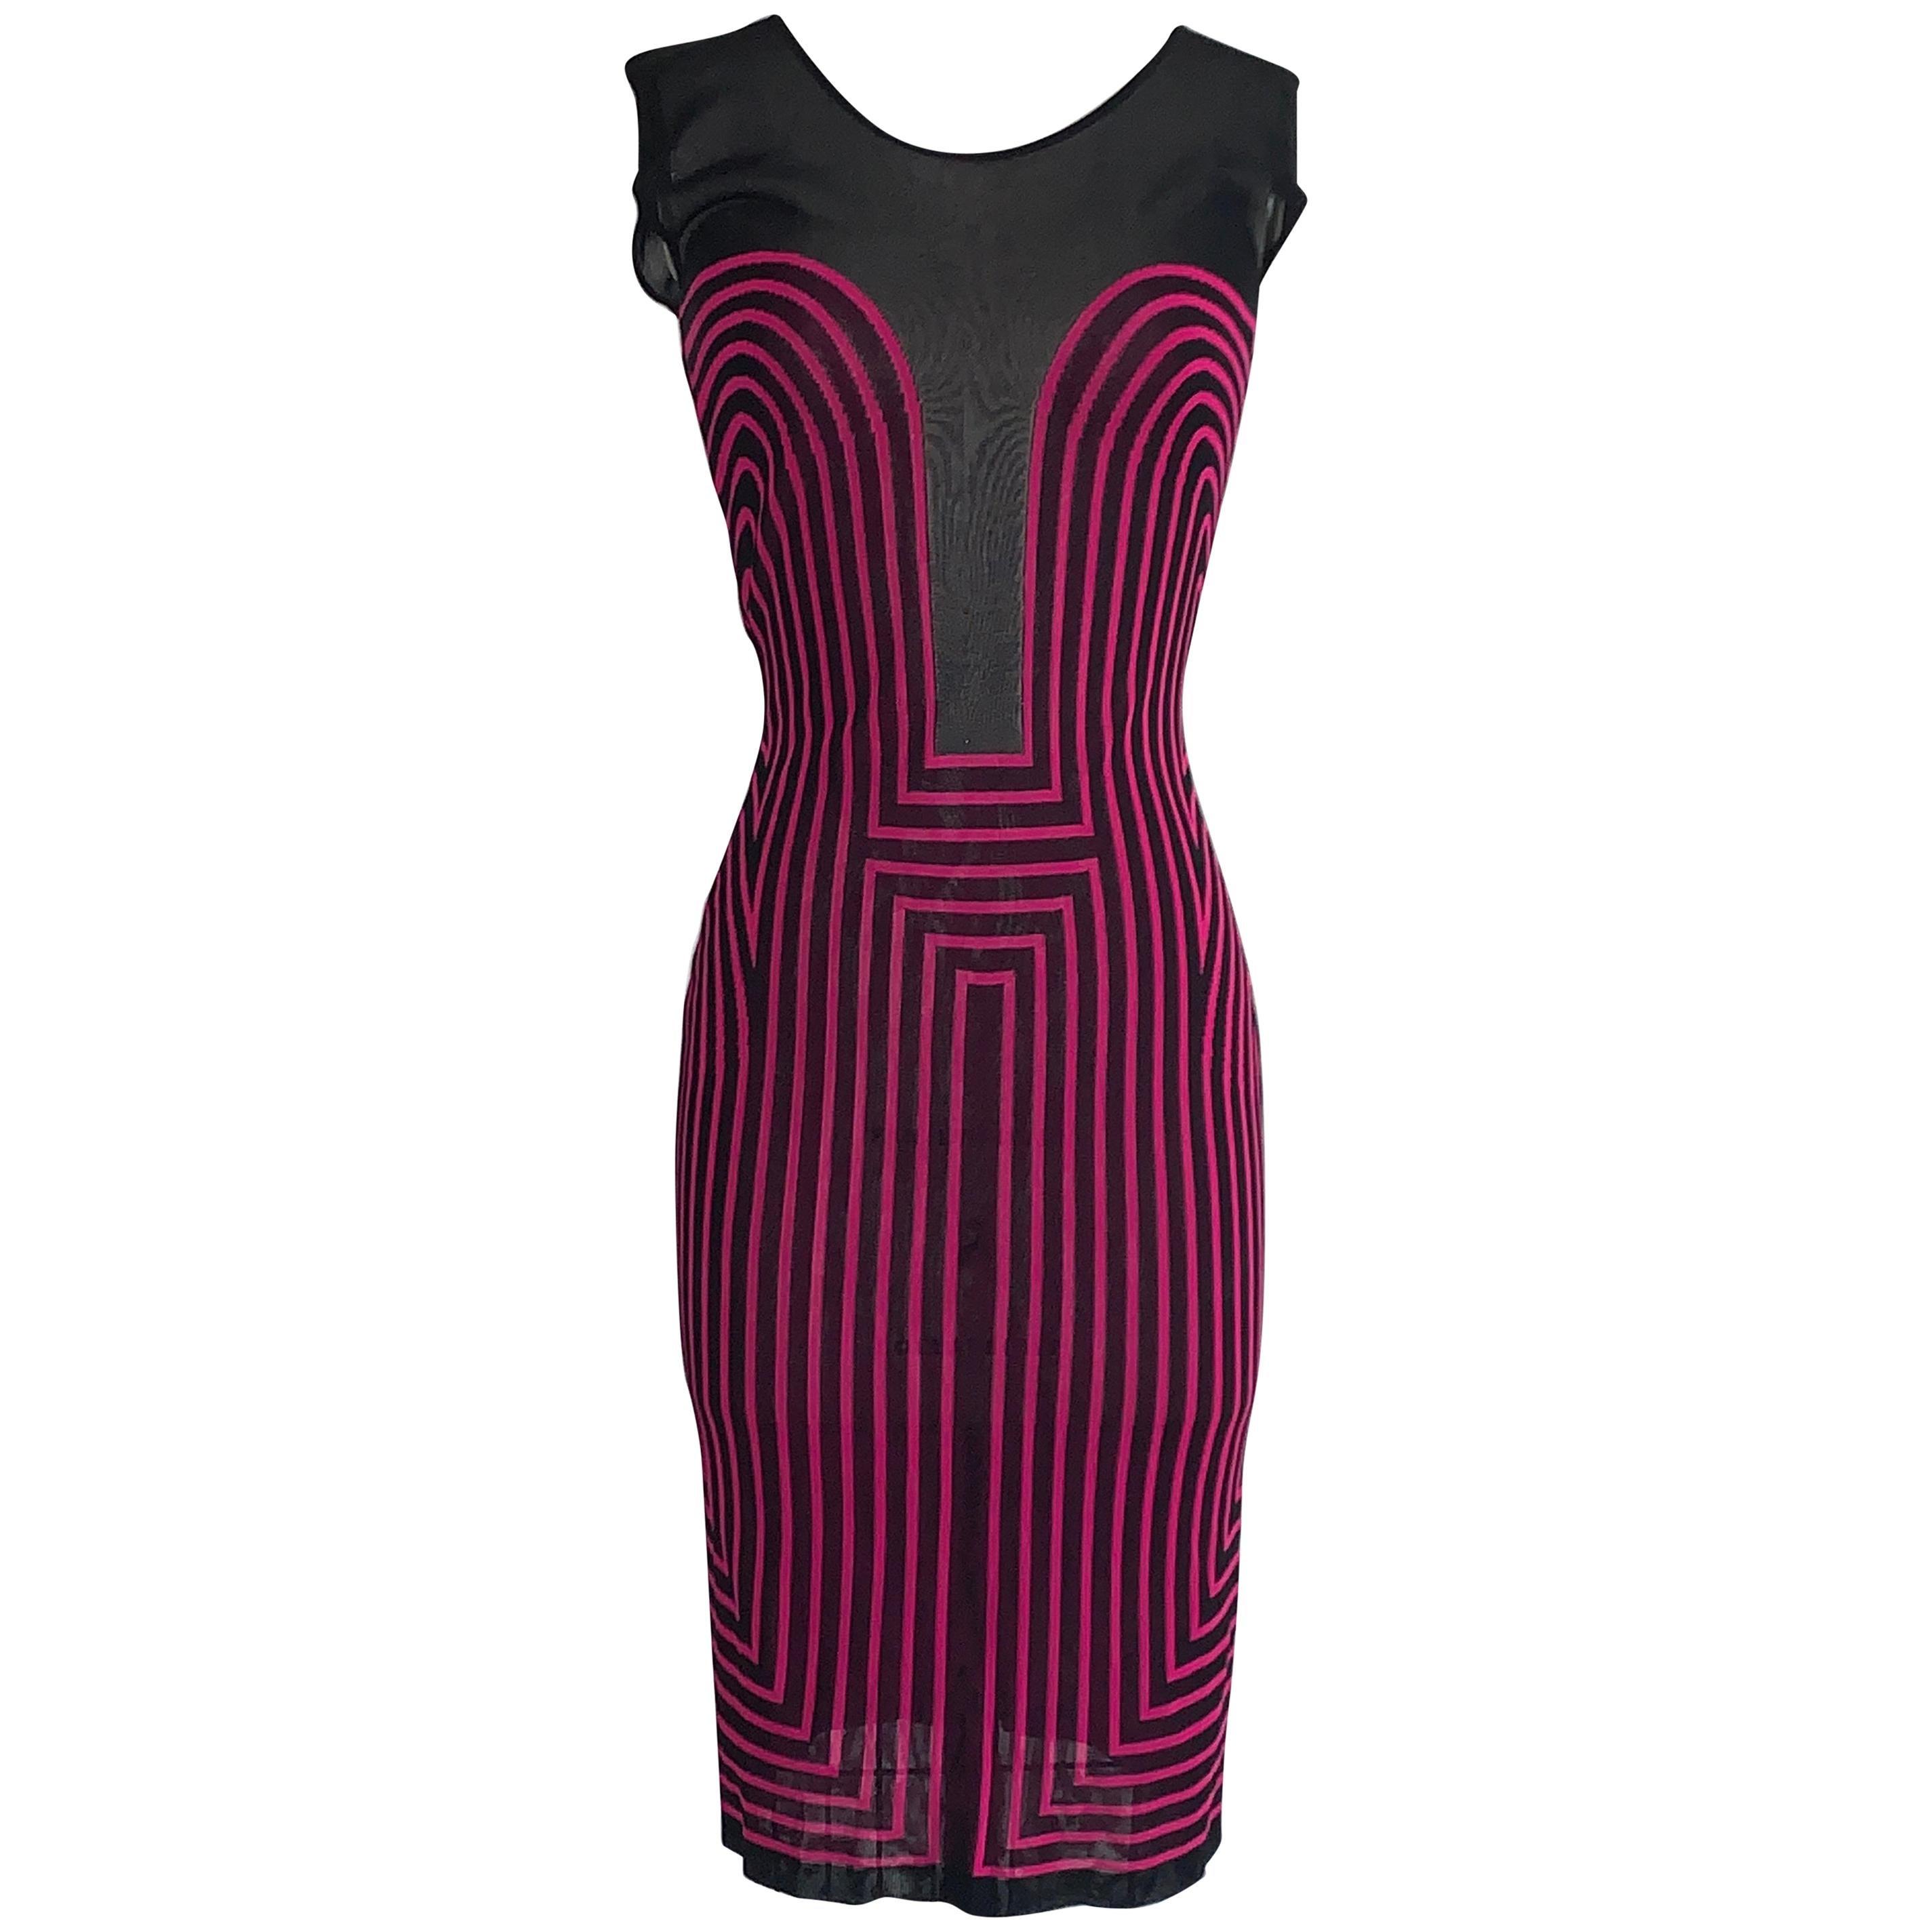 Alexander McQueen 2000s Pink and Black Op Art Knit Body Con Dress